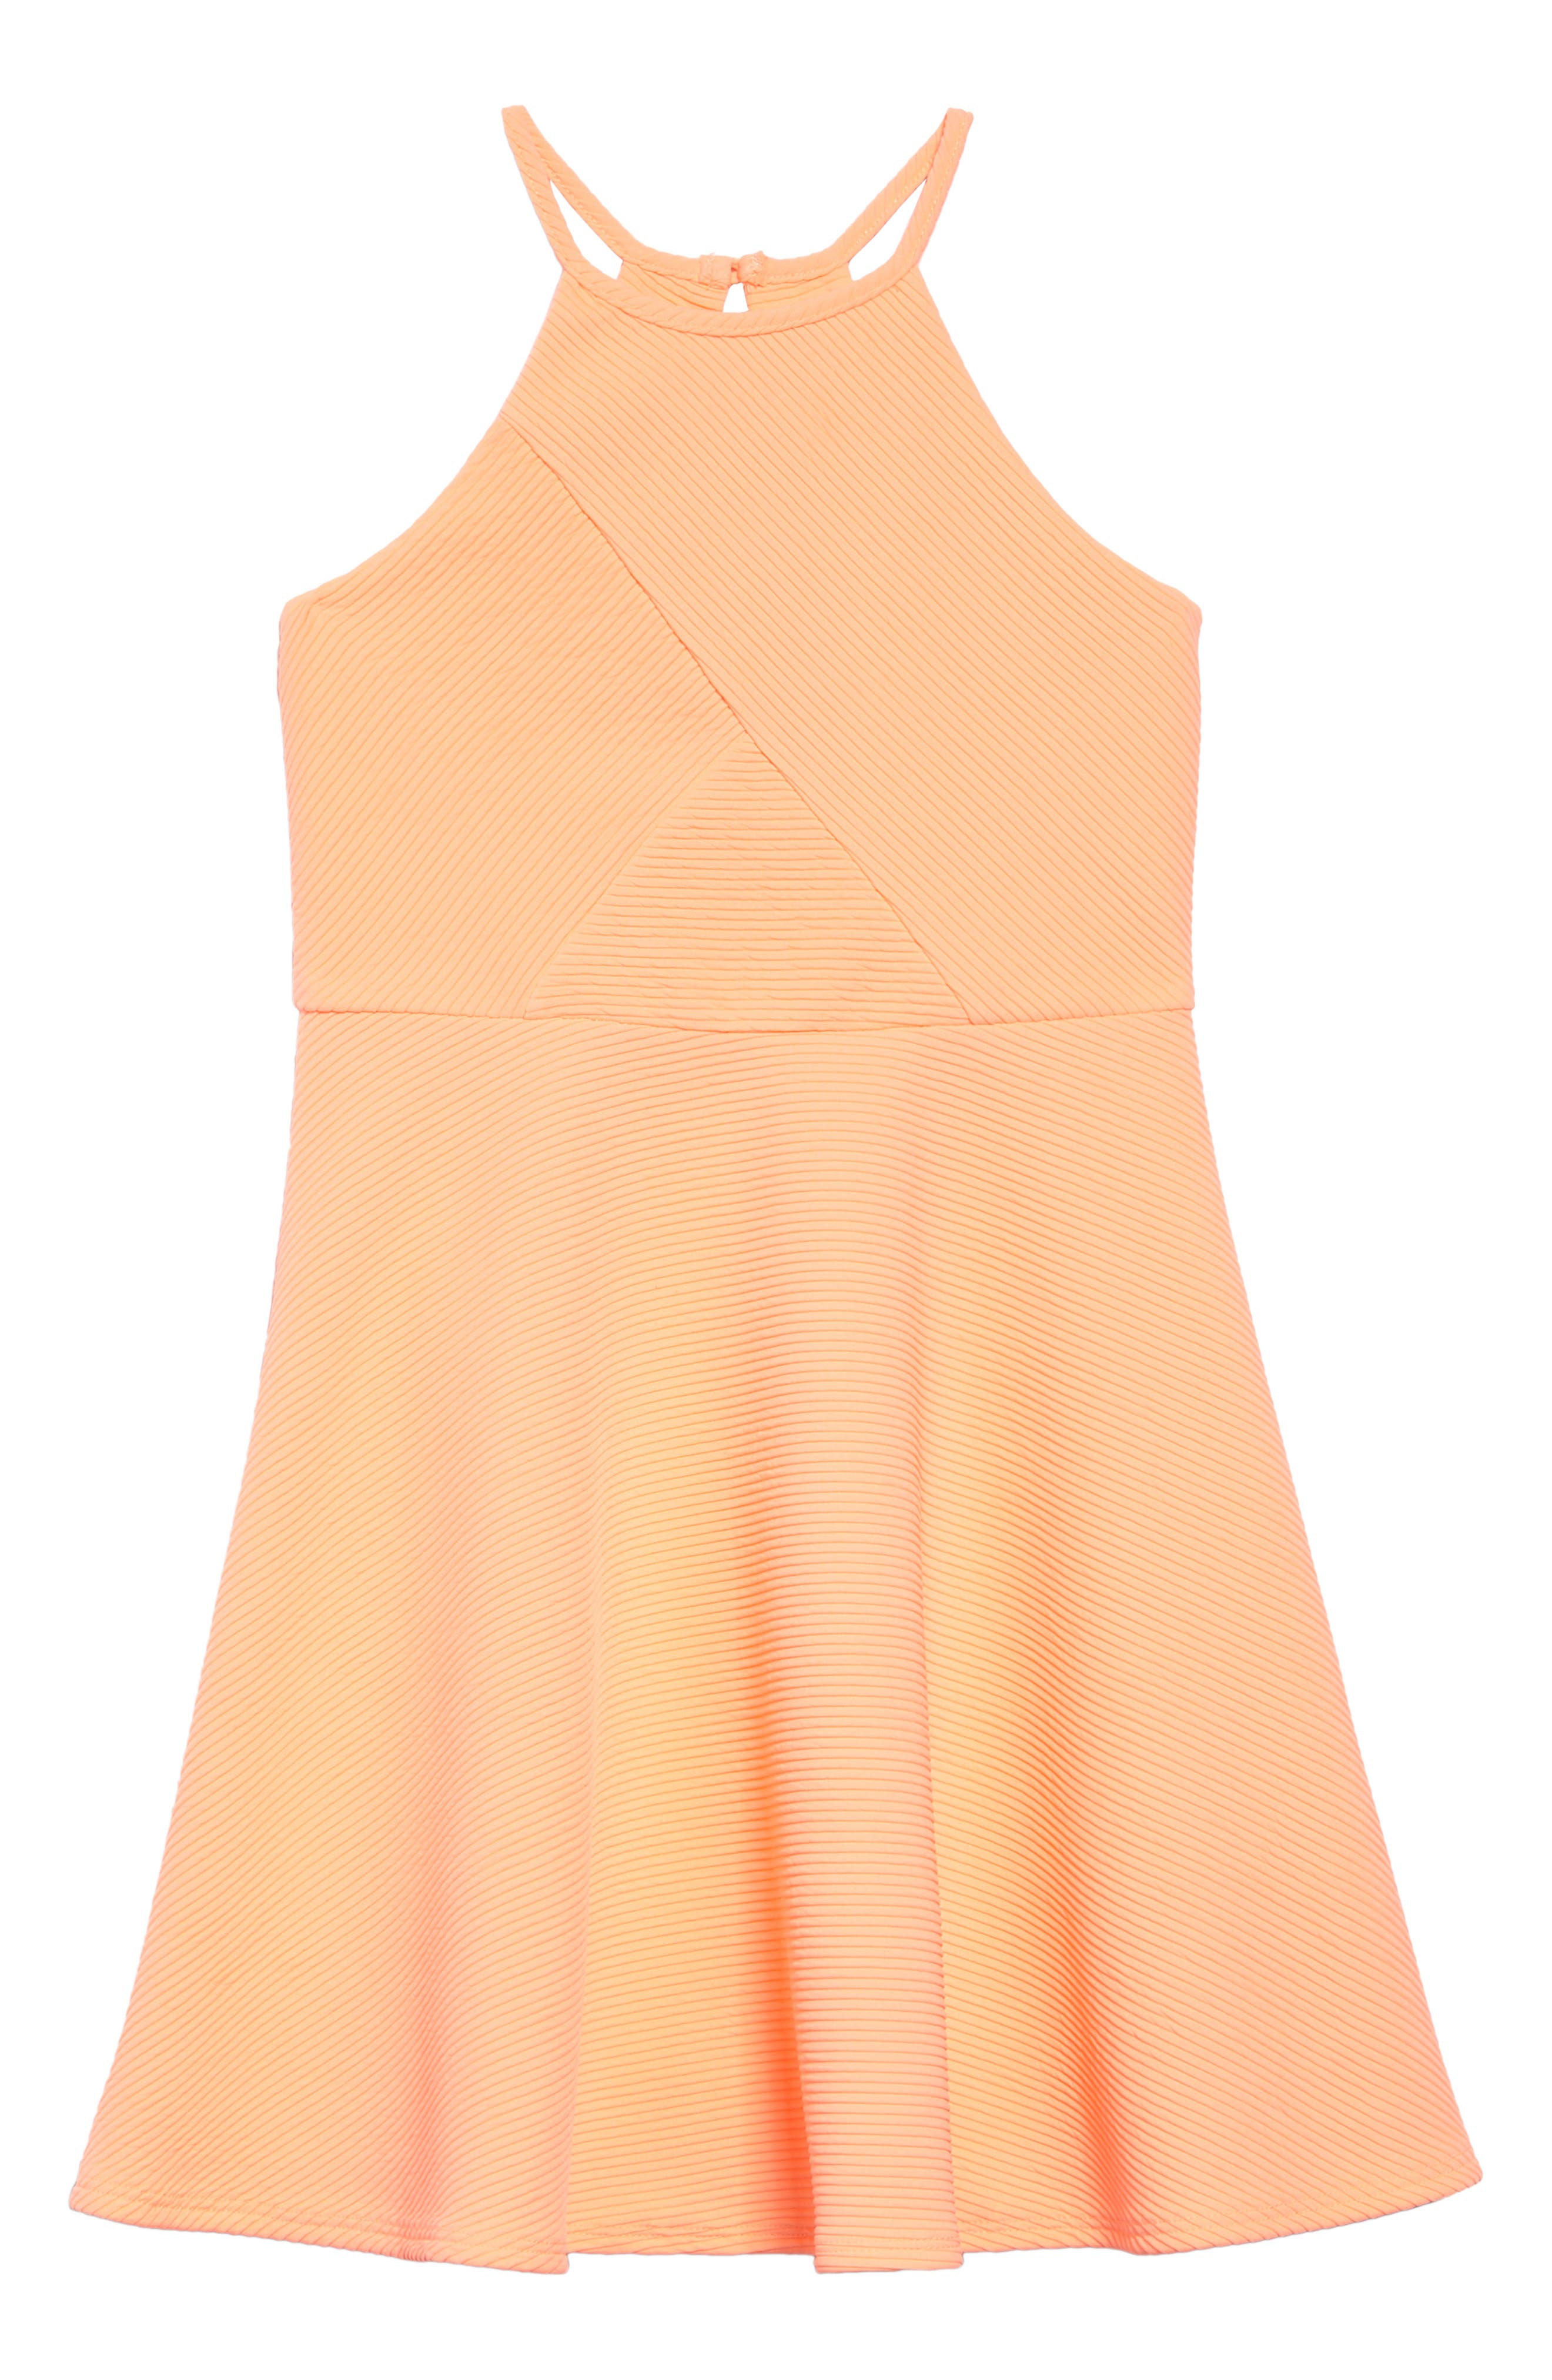 Textured Skater Dress,                             Main thumbnail 1, color,                             Neoncoral